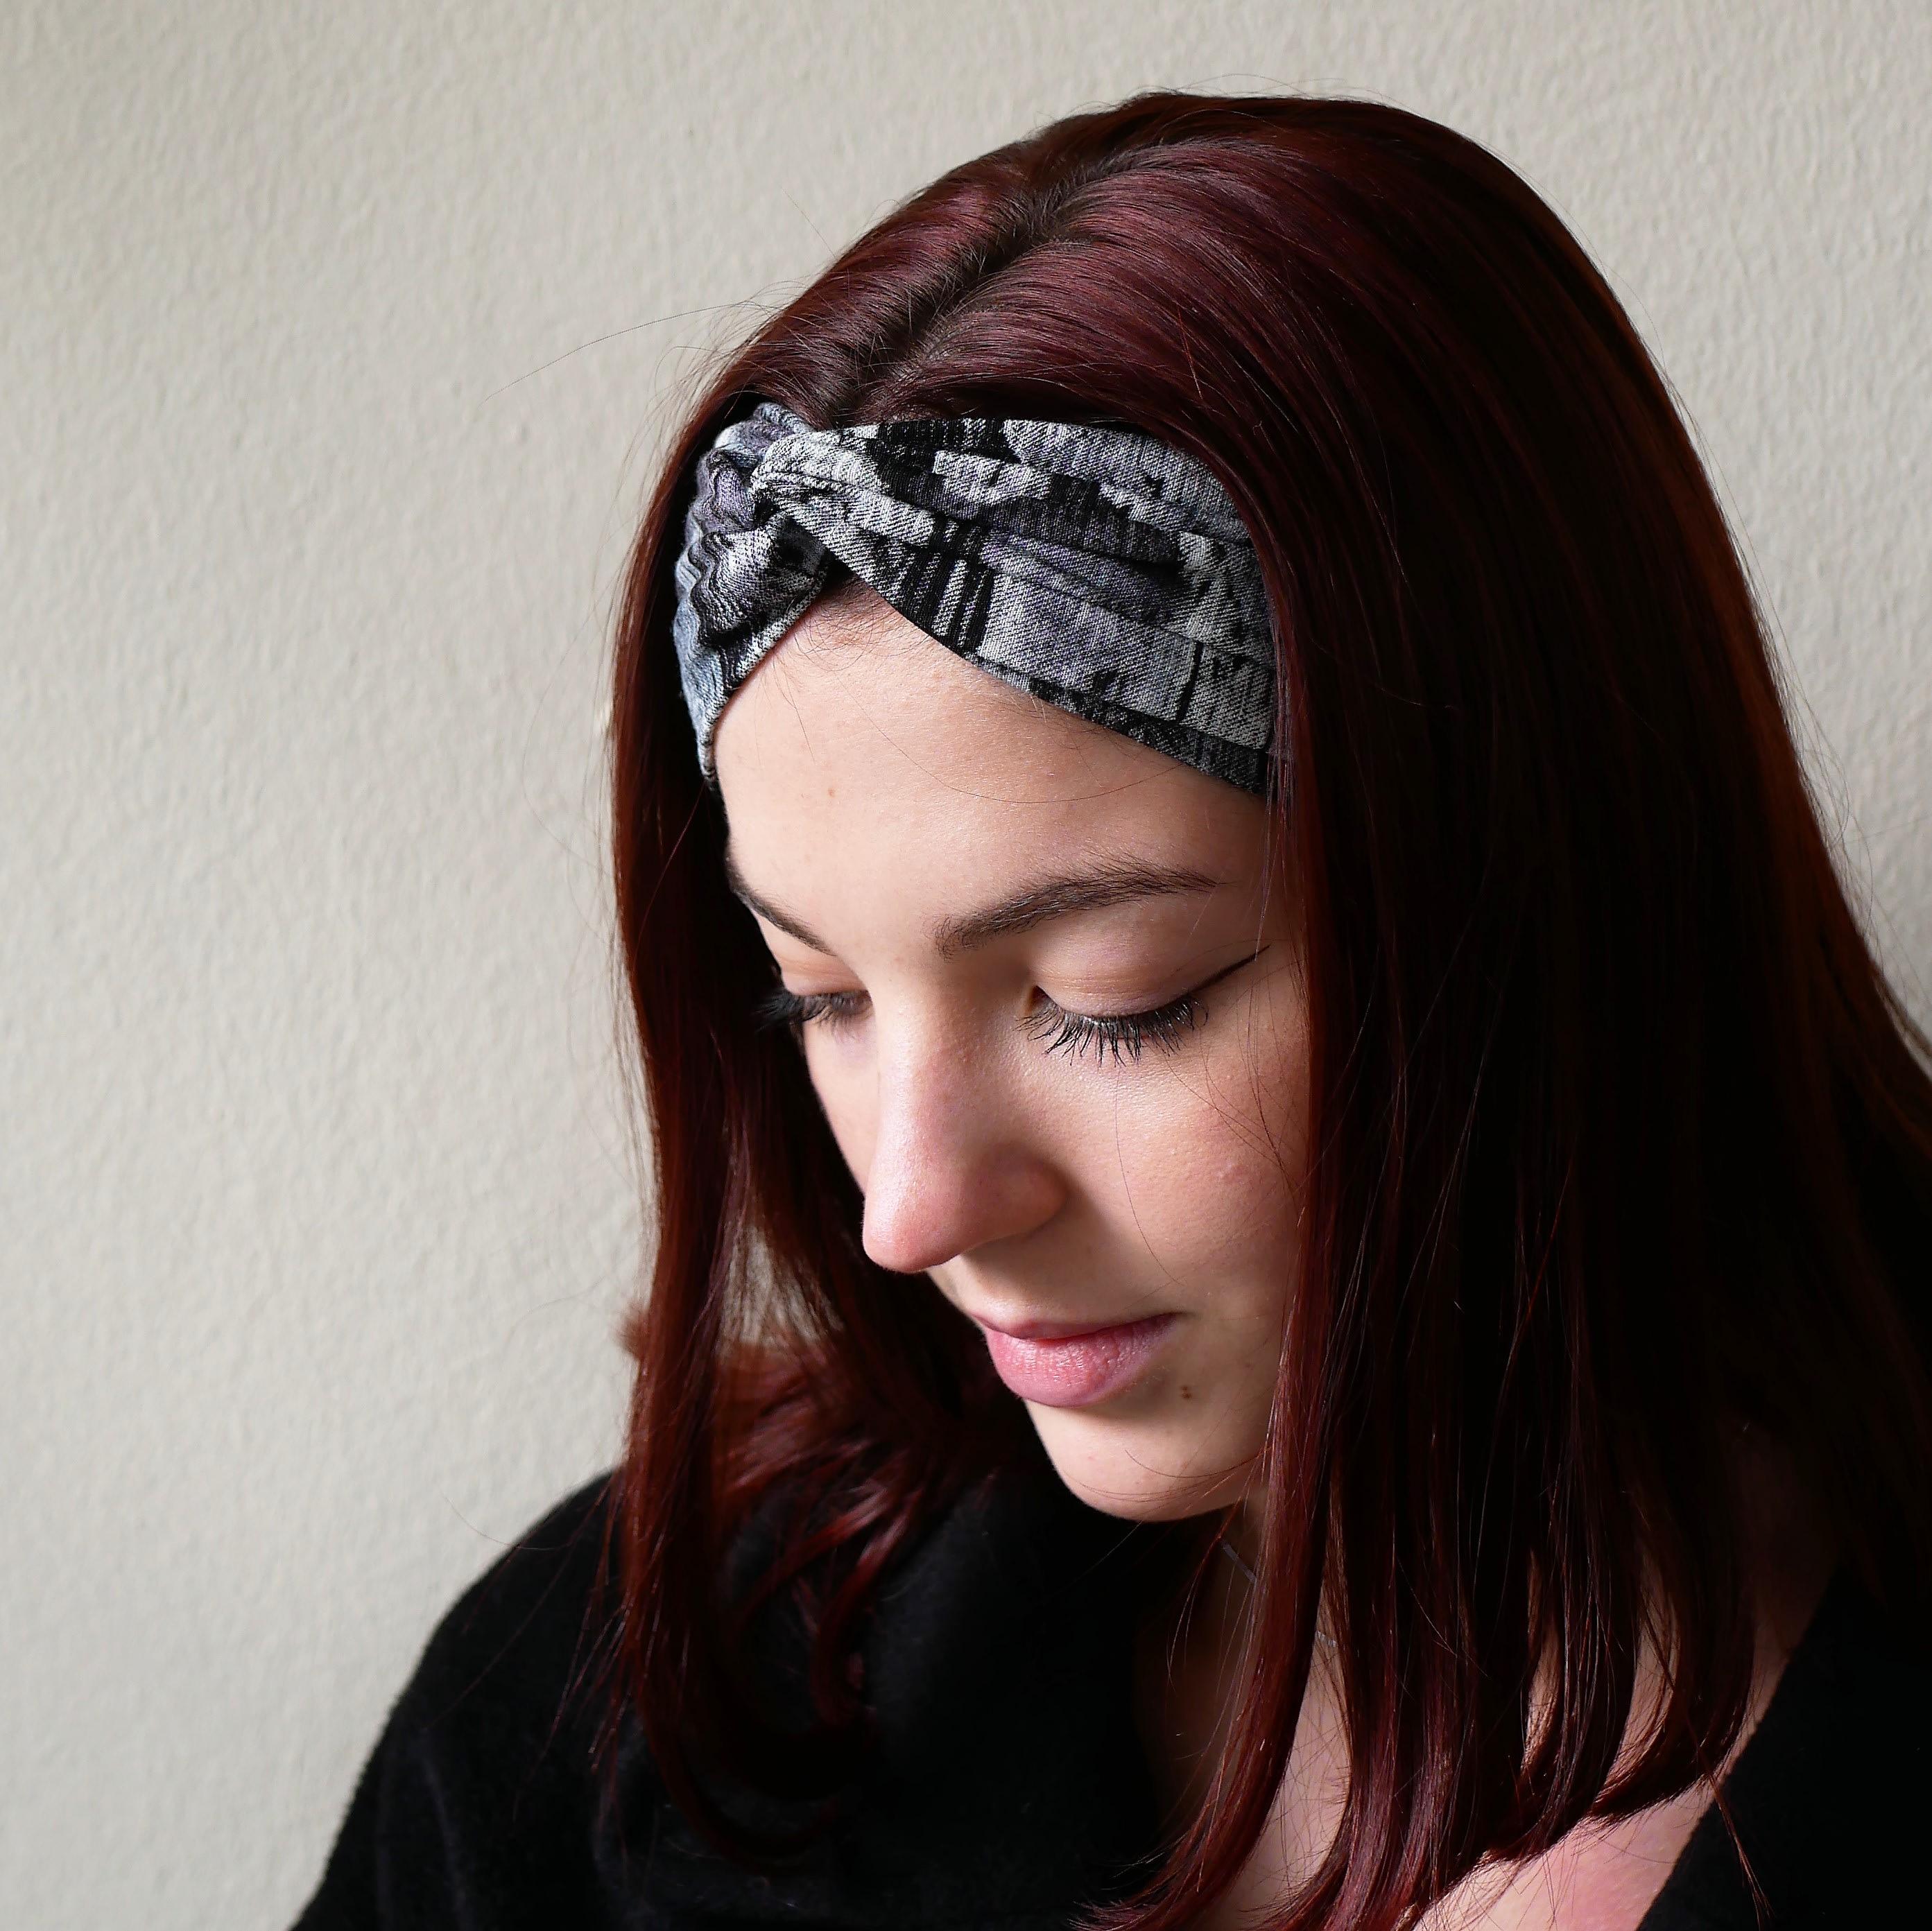 Turban headband made of grey, black, white and a bit of purple fabric. wide headband, boho headband, yoga headband, workout headband